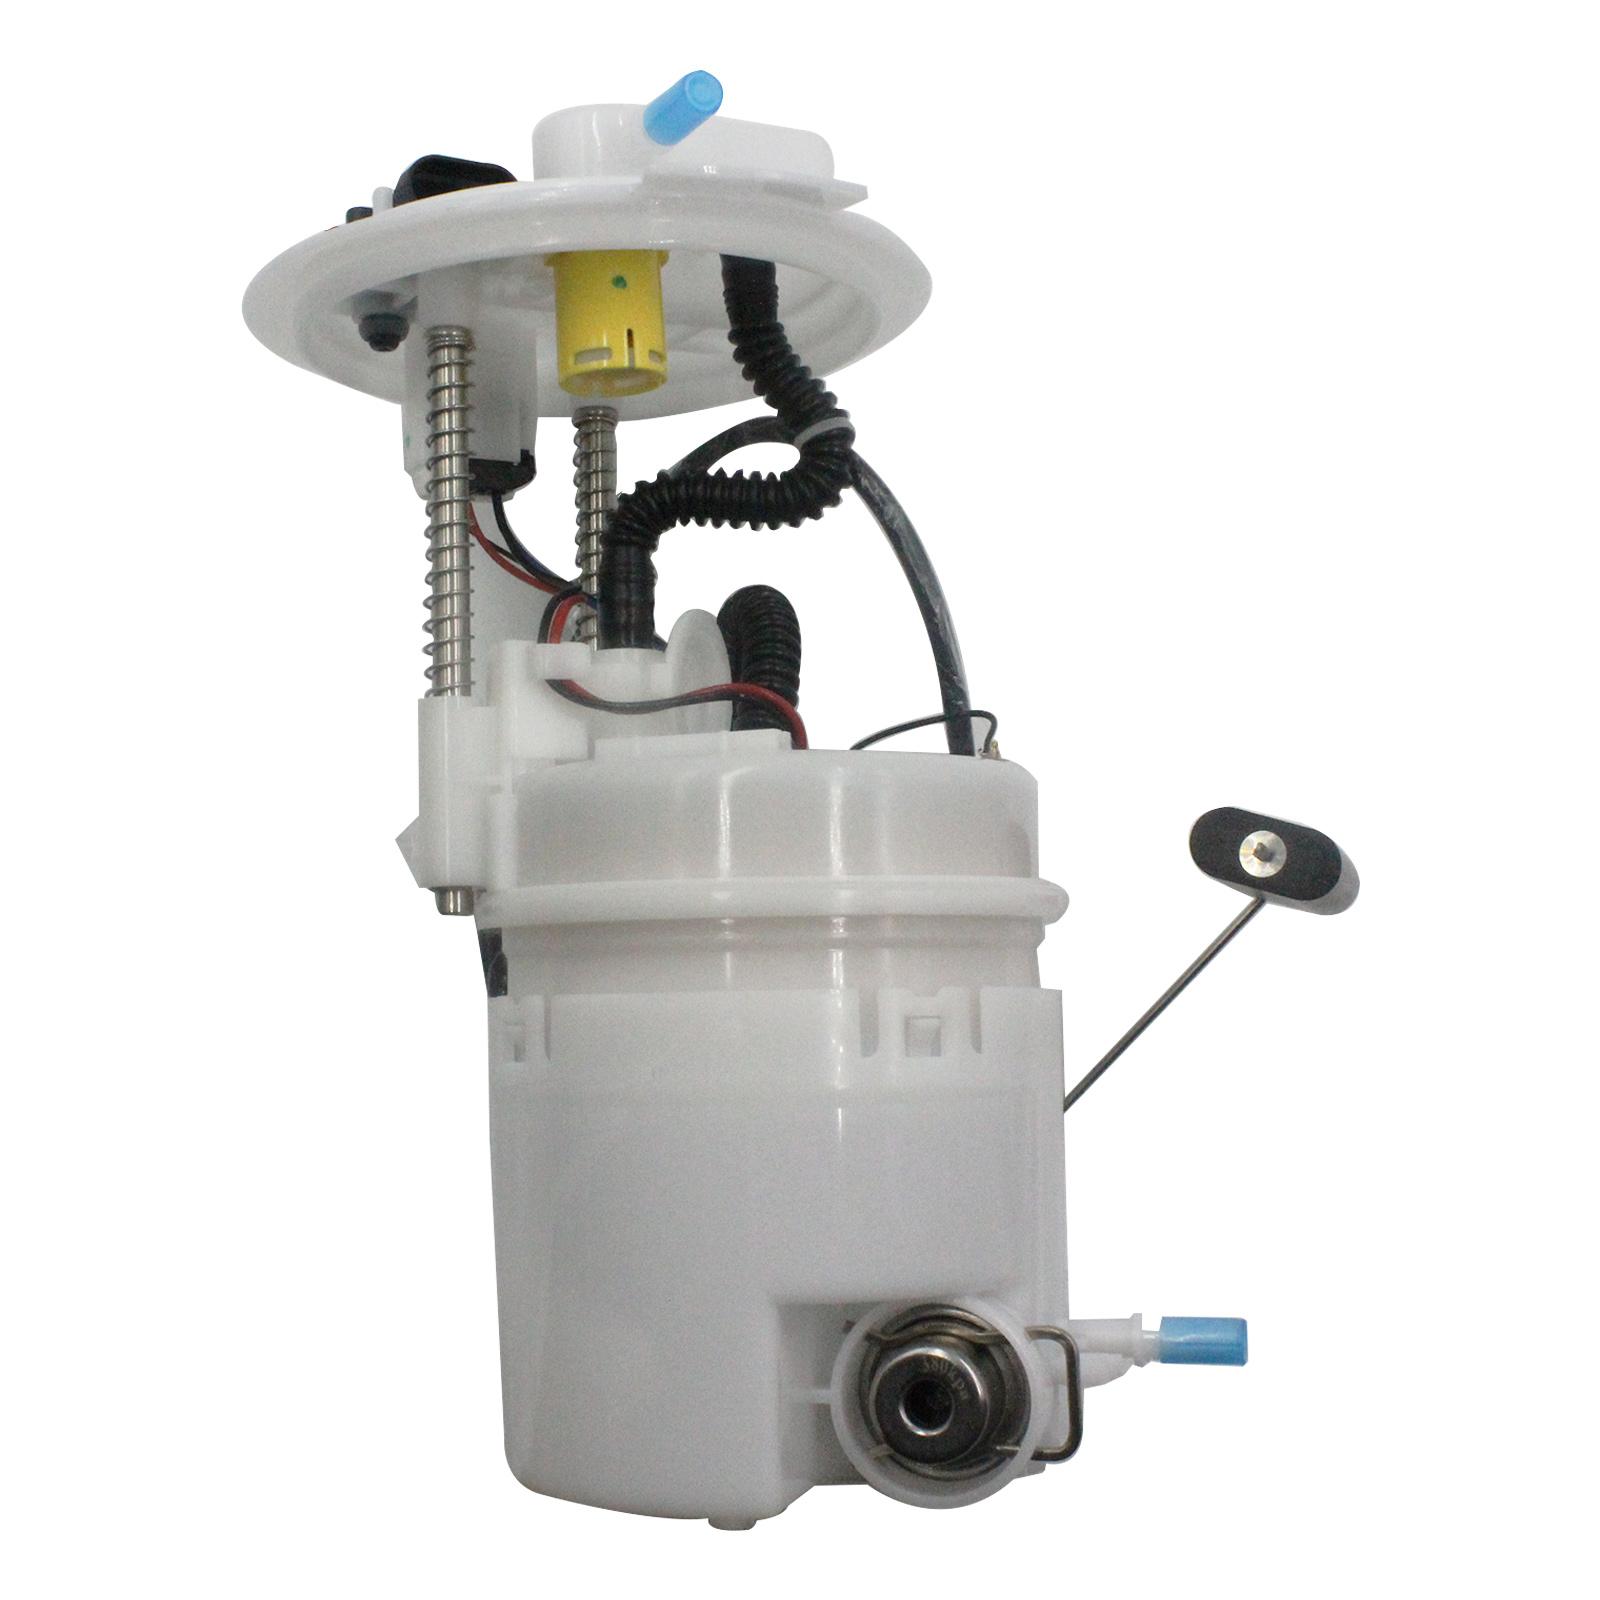 New Electric Fuel Pump Gas for Hyundai Santa Fe Kia Sorento 2011-2013